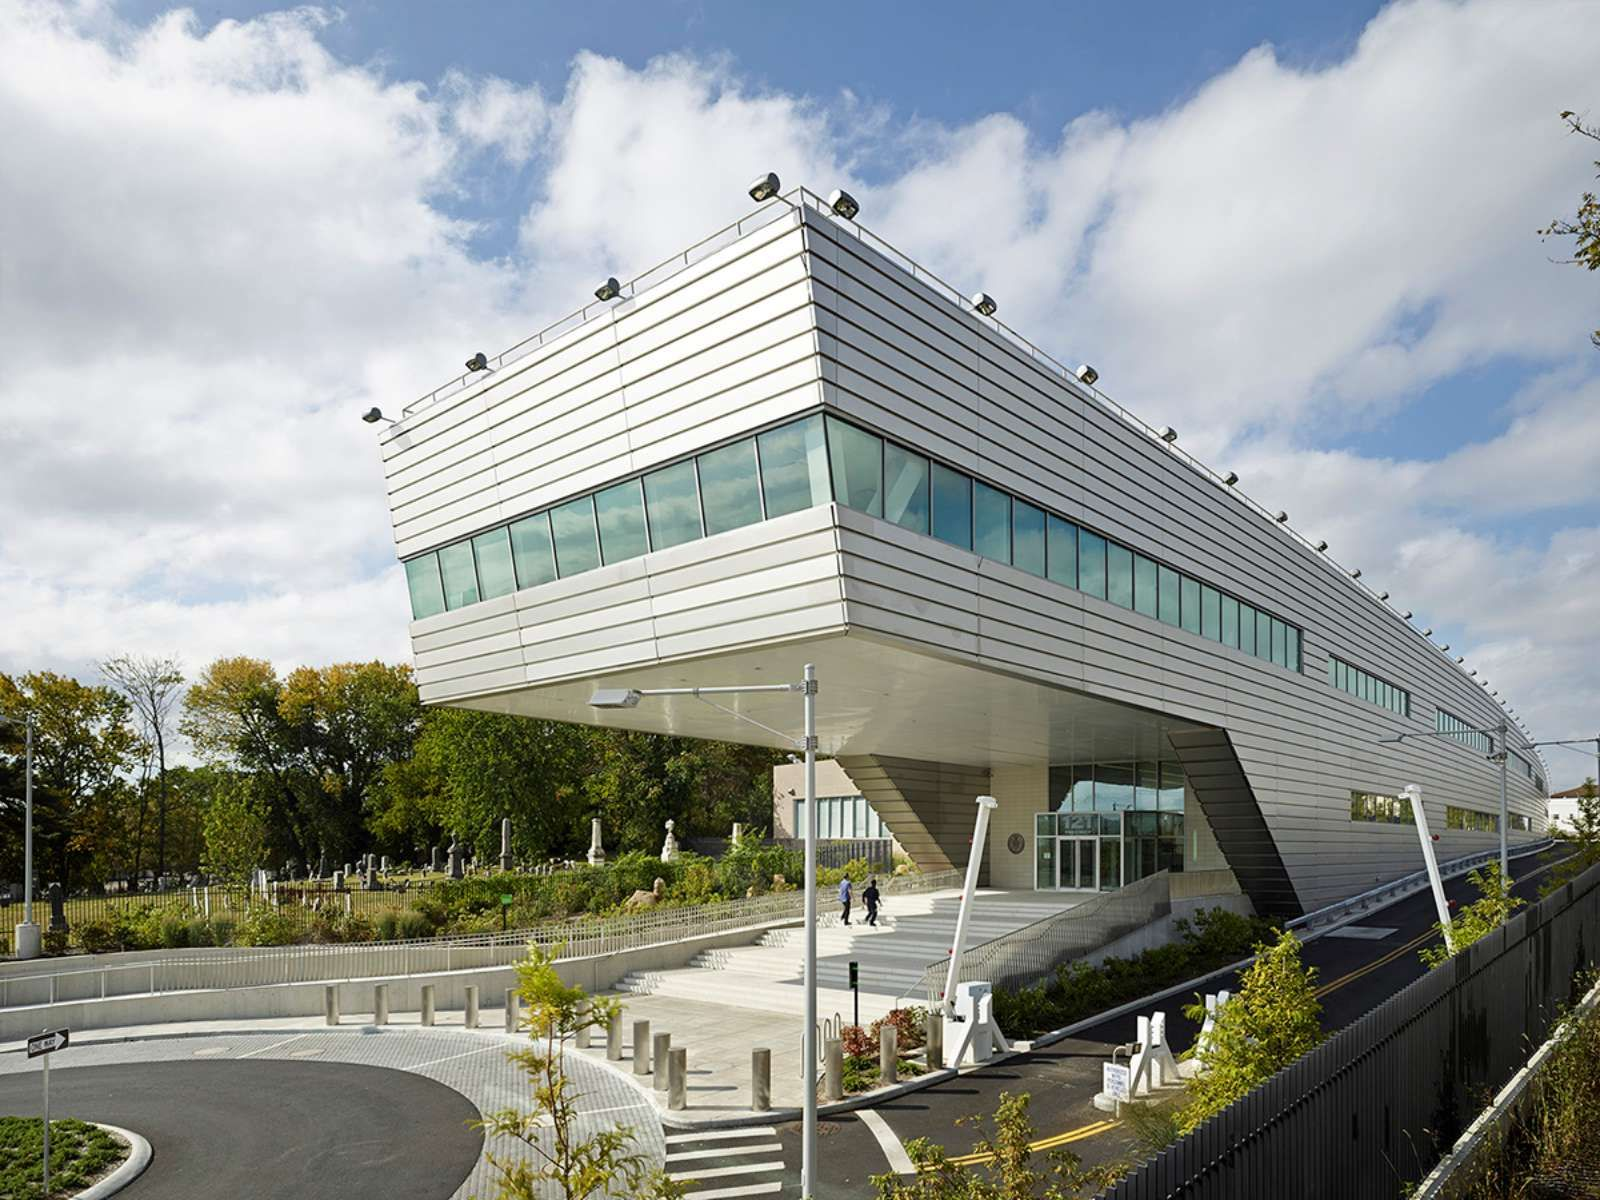 121st Police Precinct Station House By Rafael Vinoly Architects Police Precinct Architect Architecture